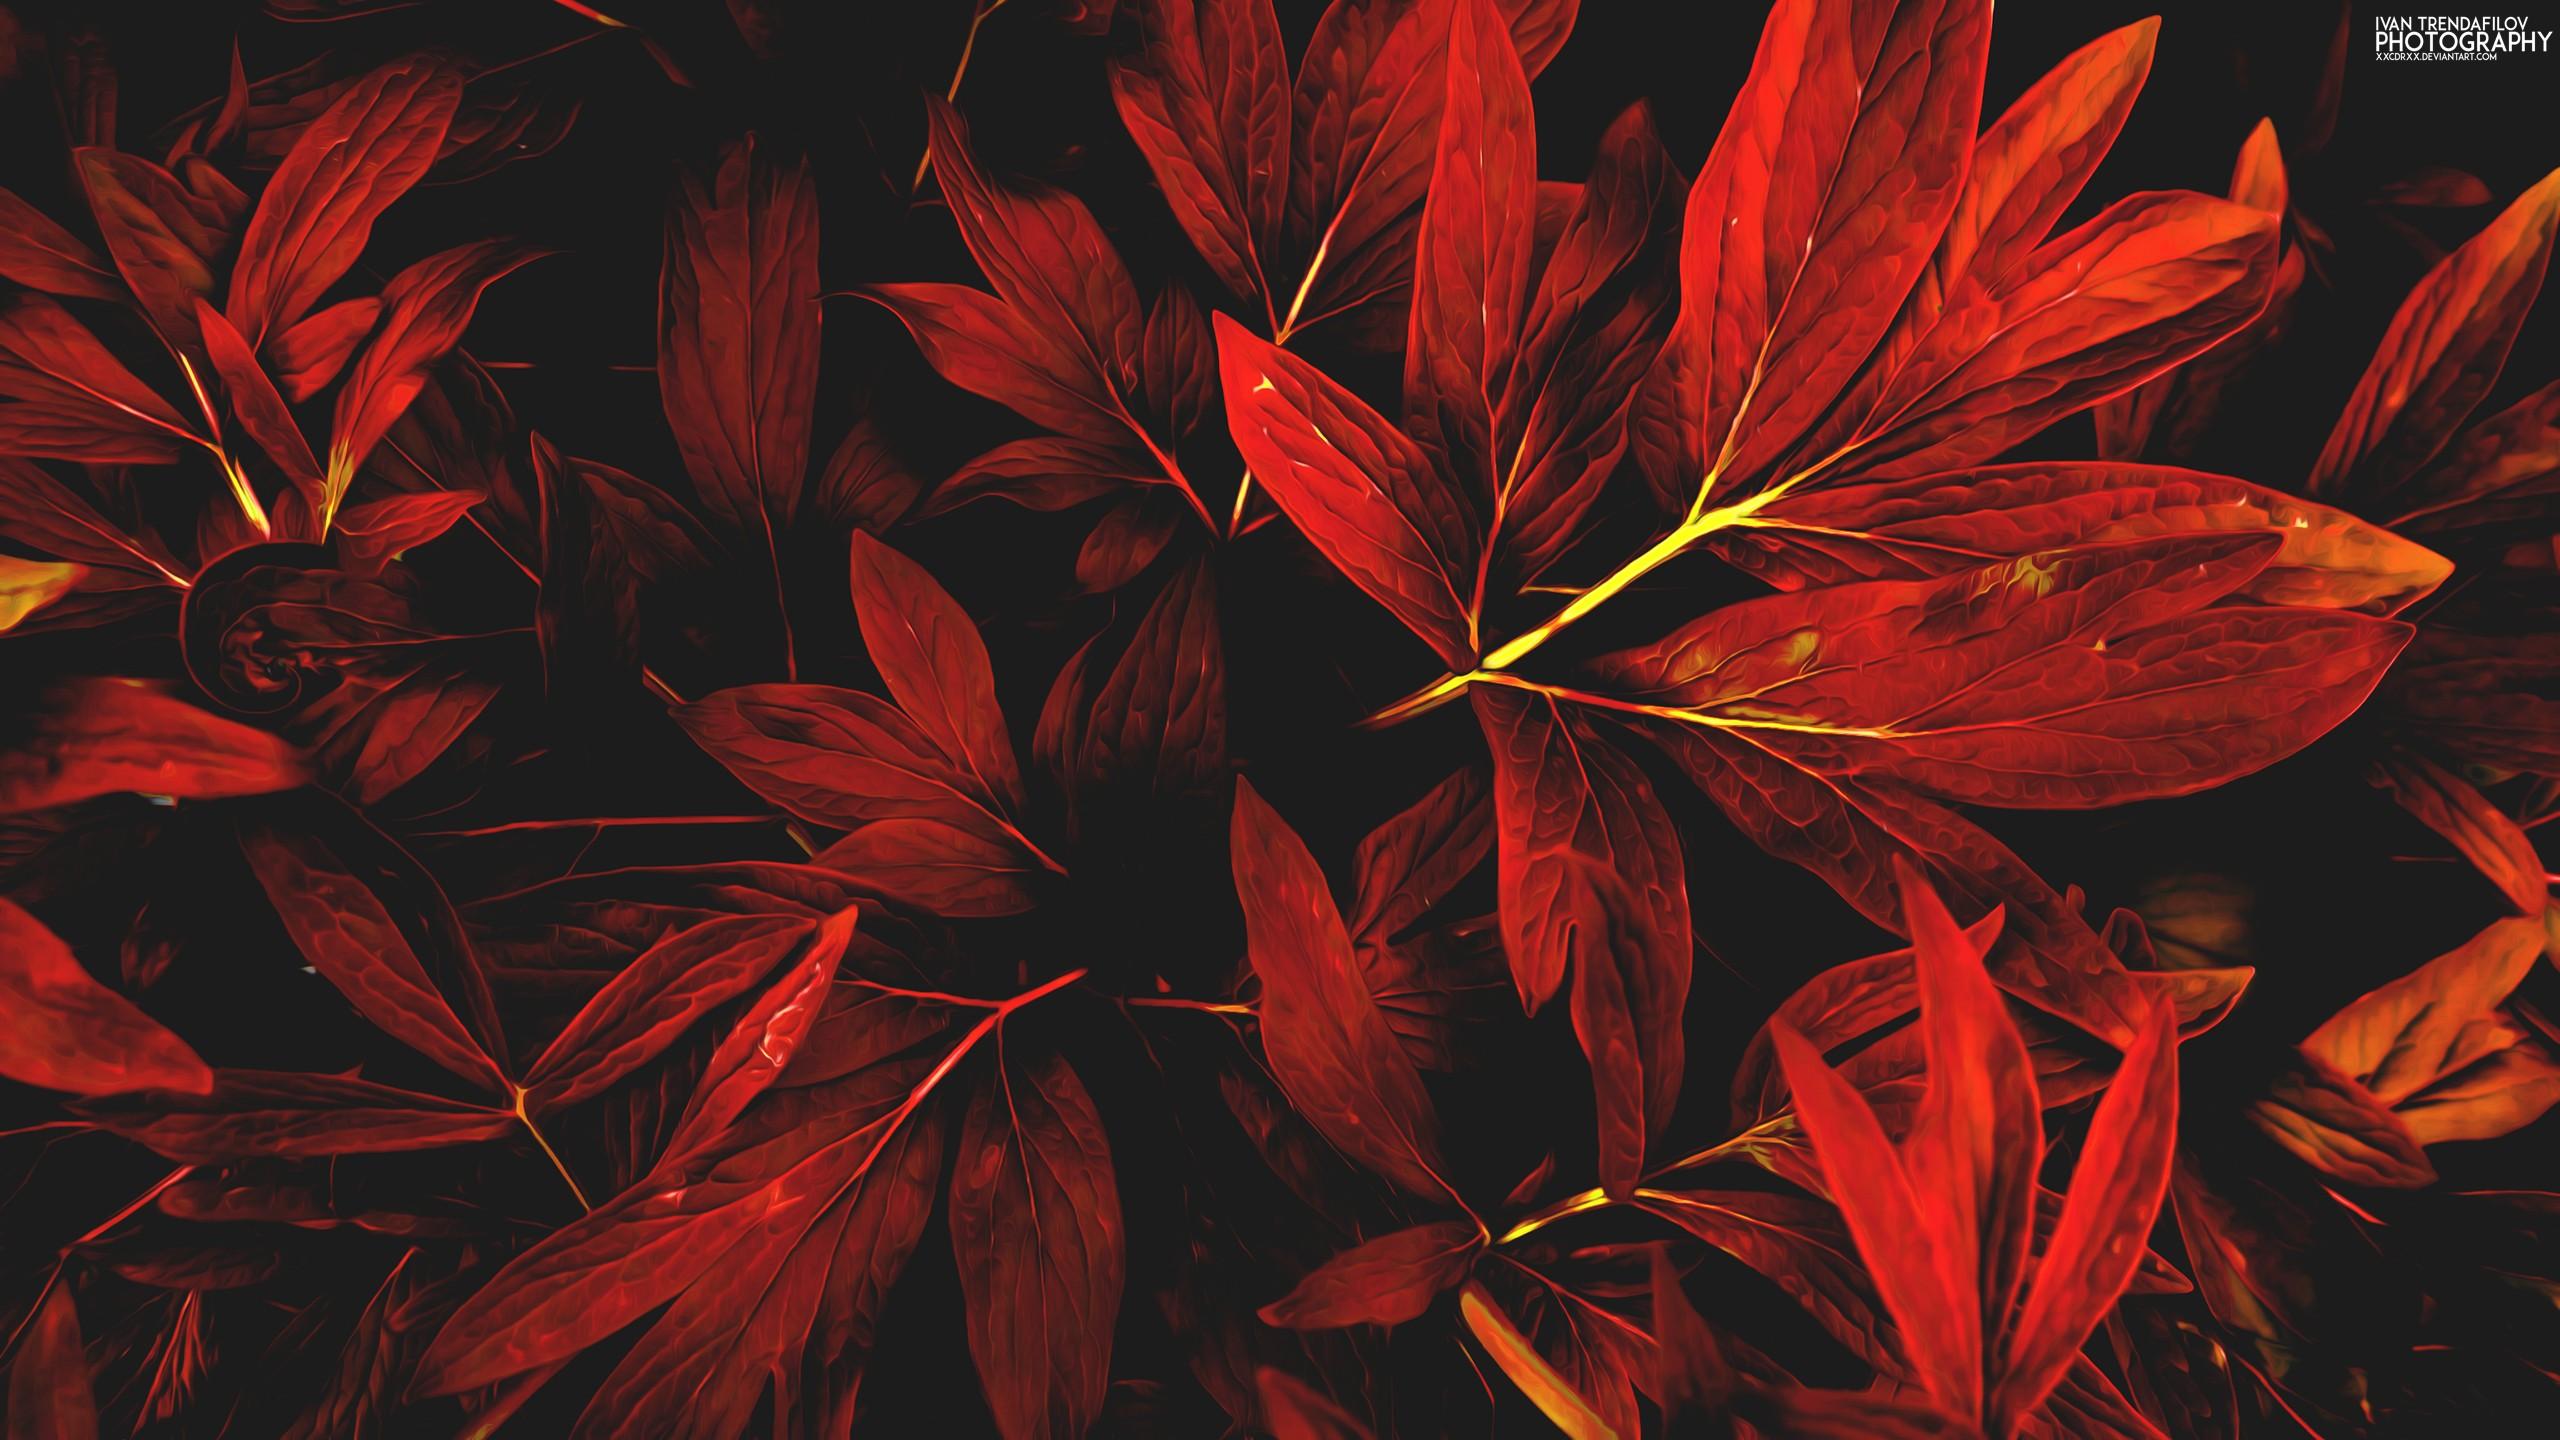 leaves nature red fall Ivan Trendafilov 1141101